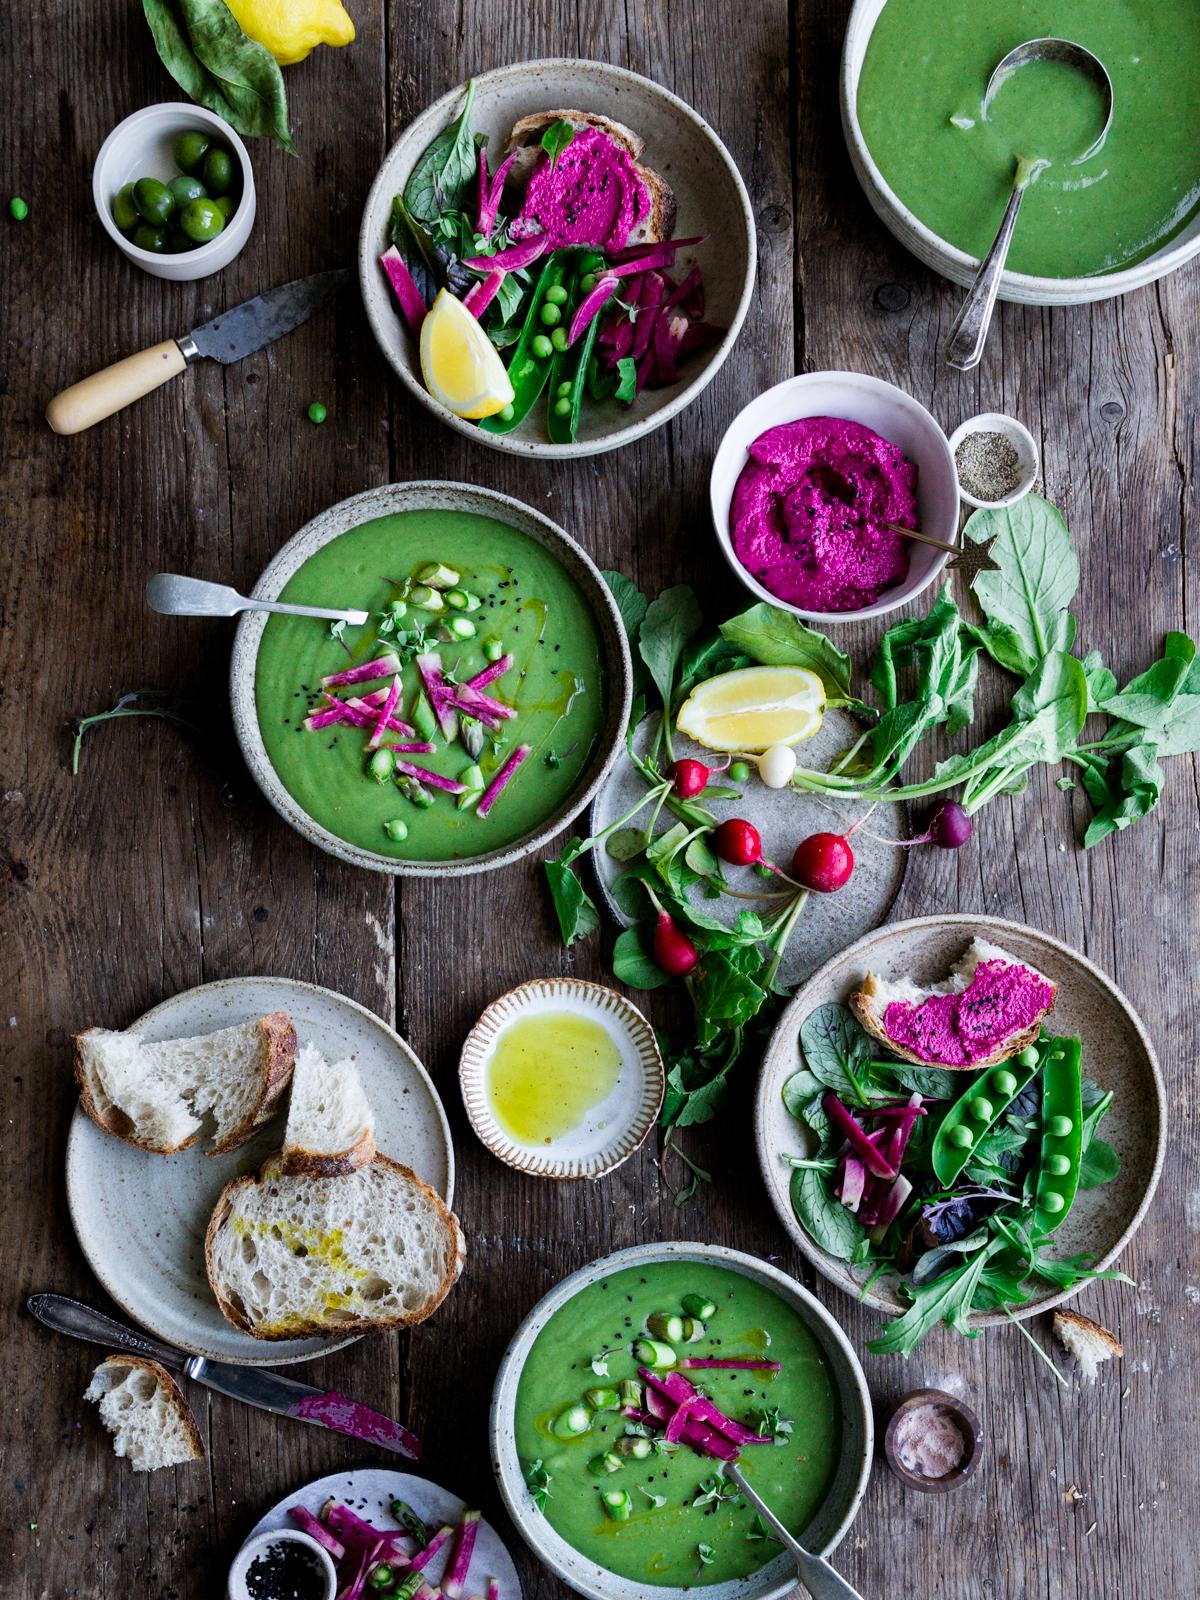 Free instagram Autumn food photo challenge - The Little Plantation